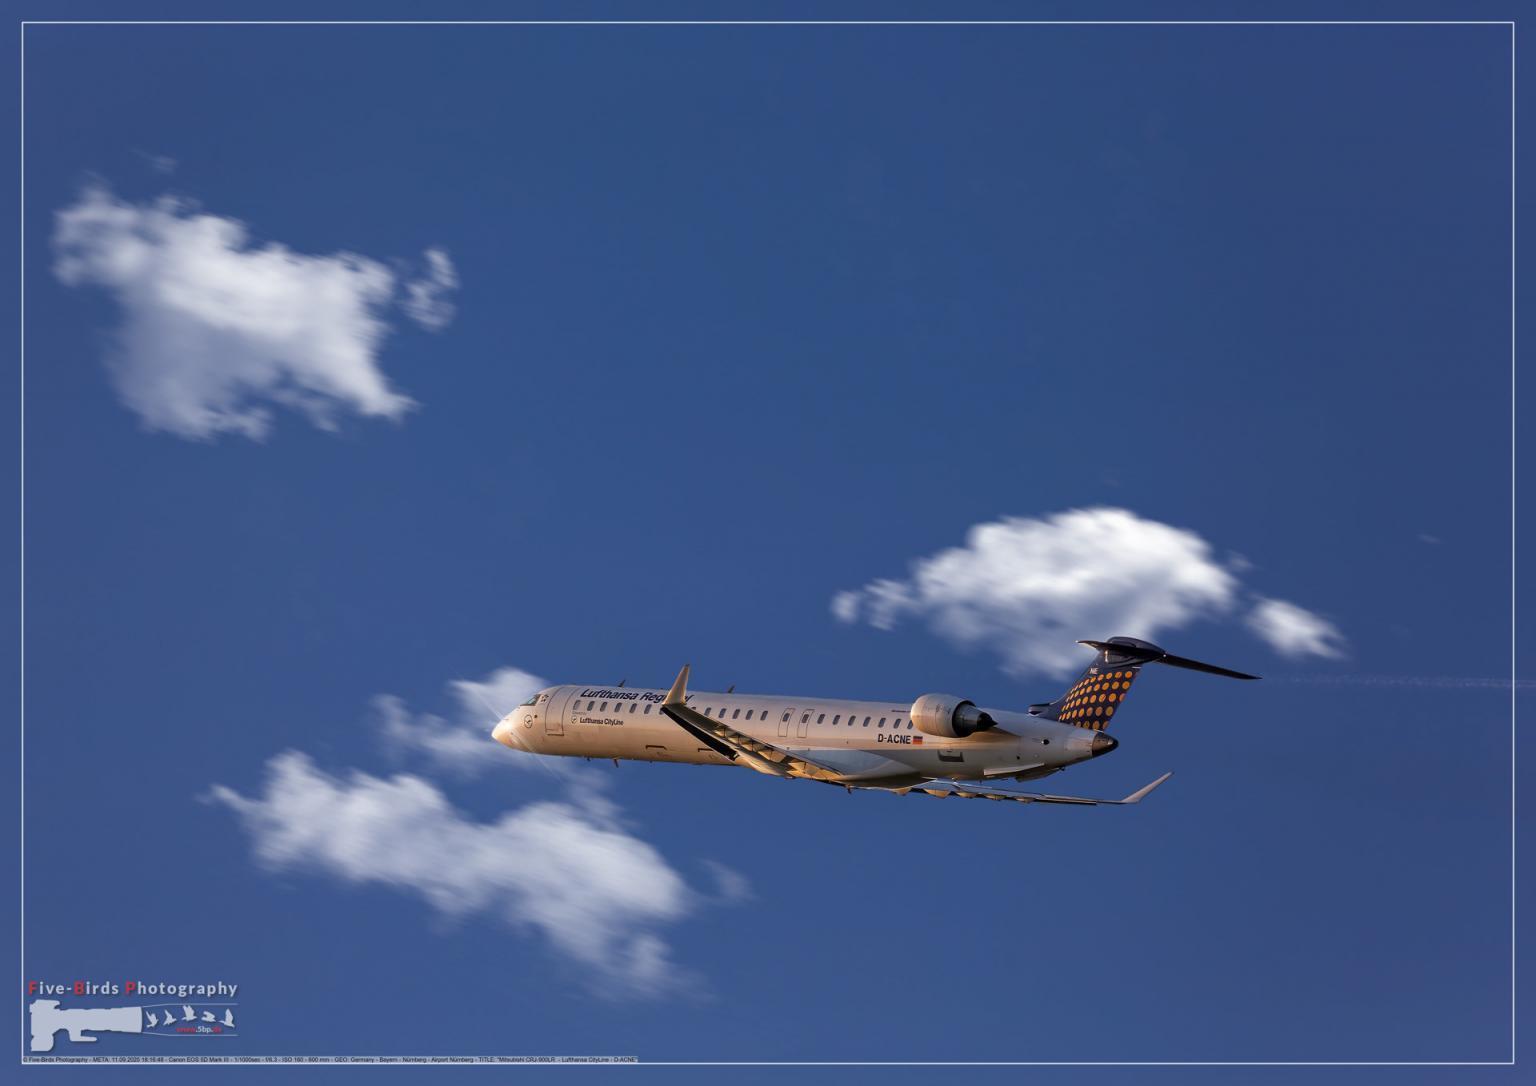 Mitsubishi CRJ-900LR - Lufthansa CityLine - D-ACNE